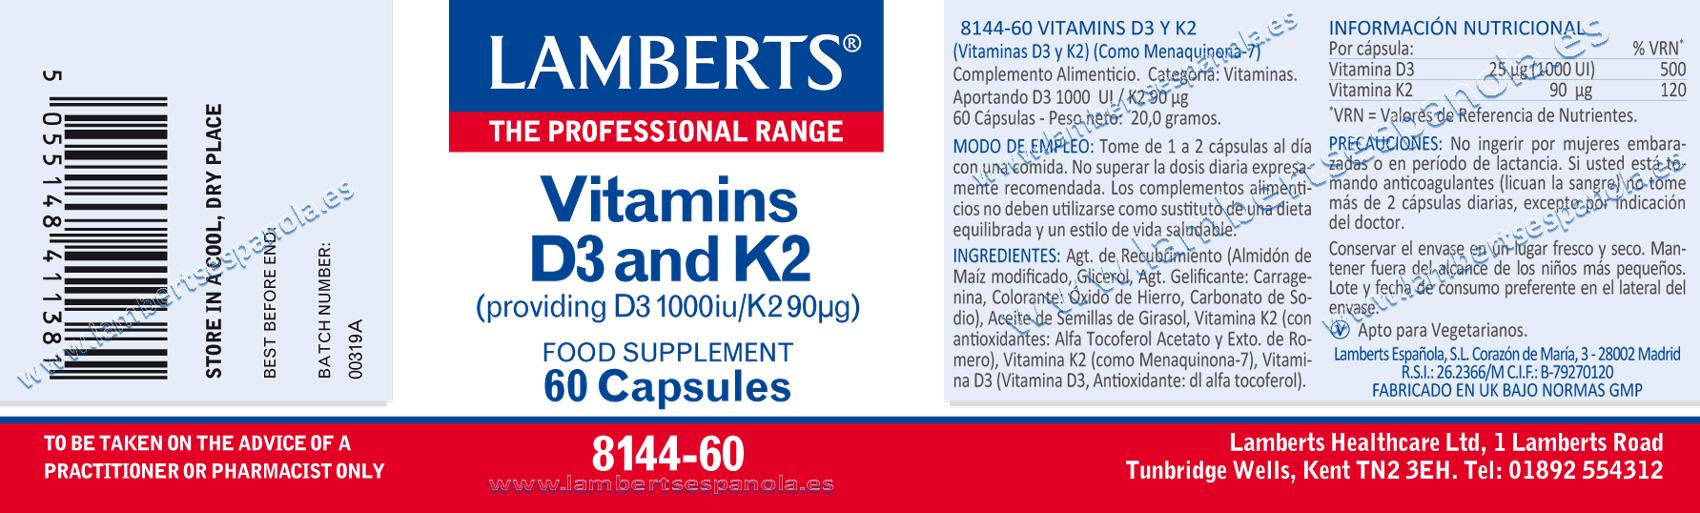 Vitamina D3 con vitamina K2